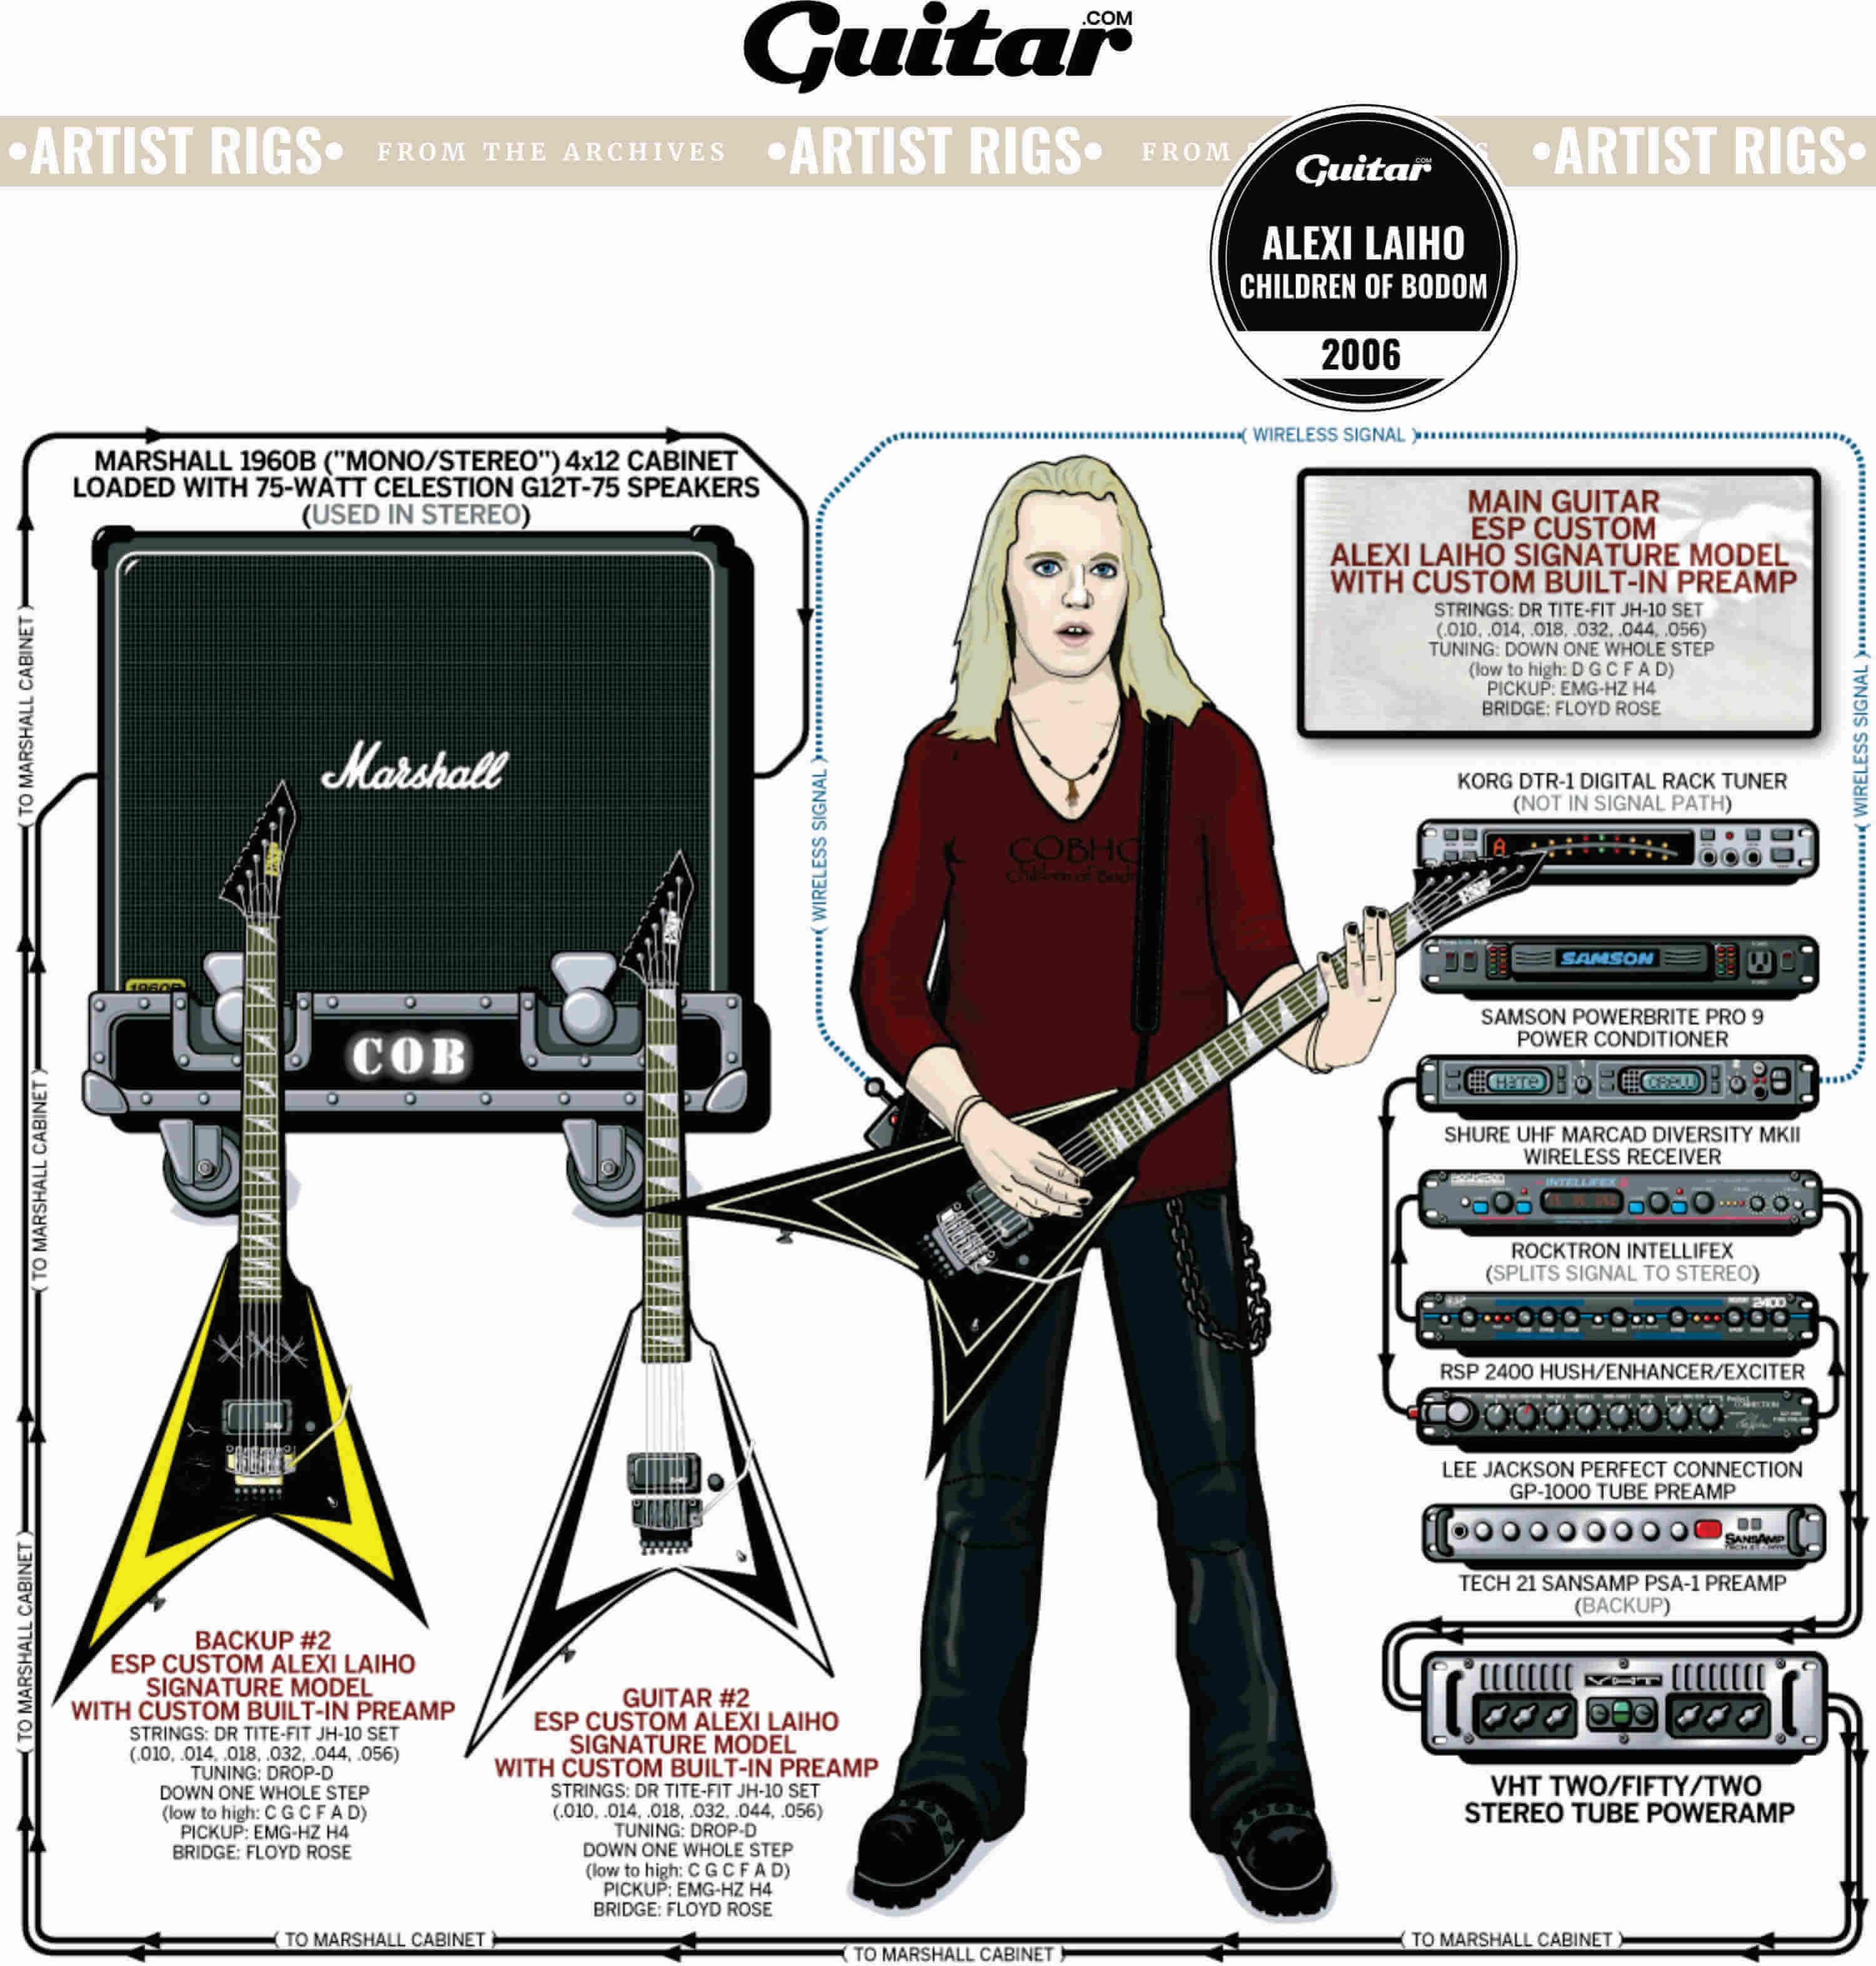 Rig Diagram: Alexi Laiho, Children Of Bodom (2006)